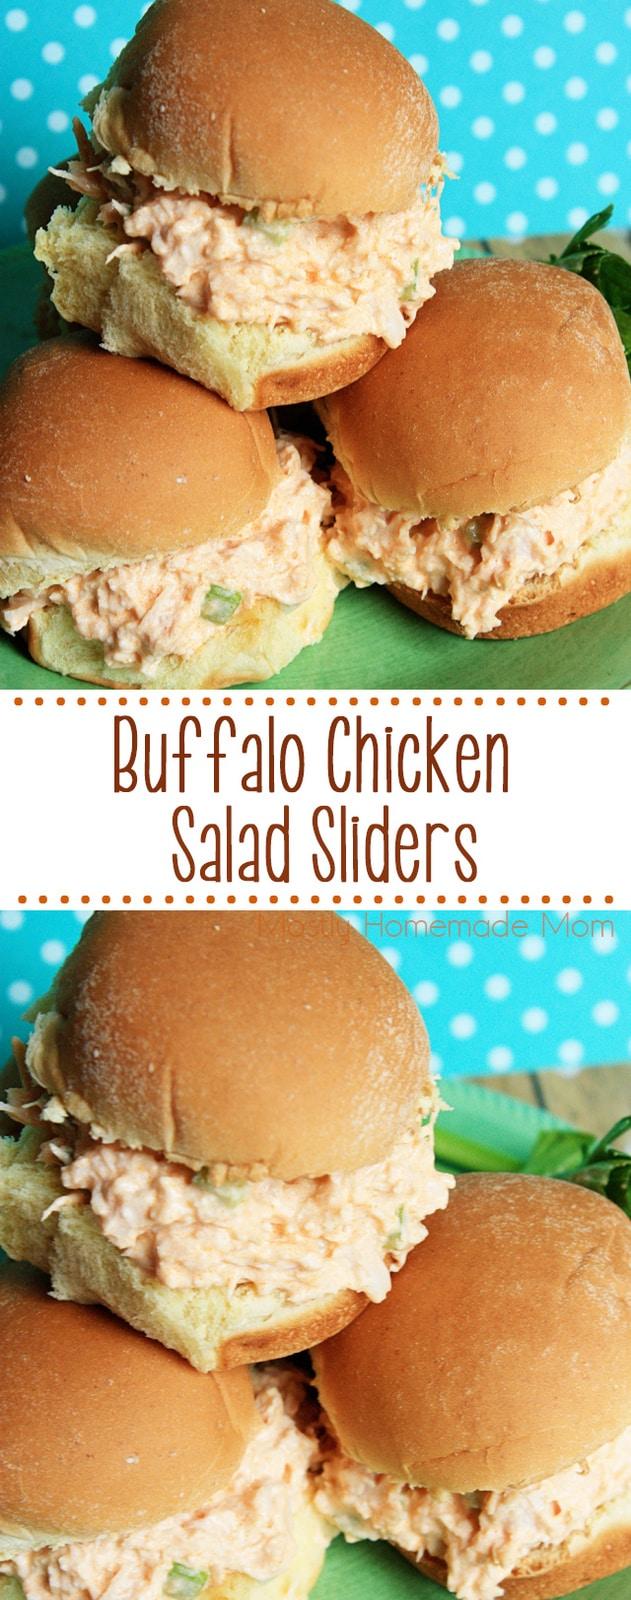 Buffalo Chicken Salad - cooked chicken, hot sauce, diced celery, and seasonings. Served over Hawaiian dinner rolls! #buffalochicken #chickensalad #sliders #lunch #gameday #recipe